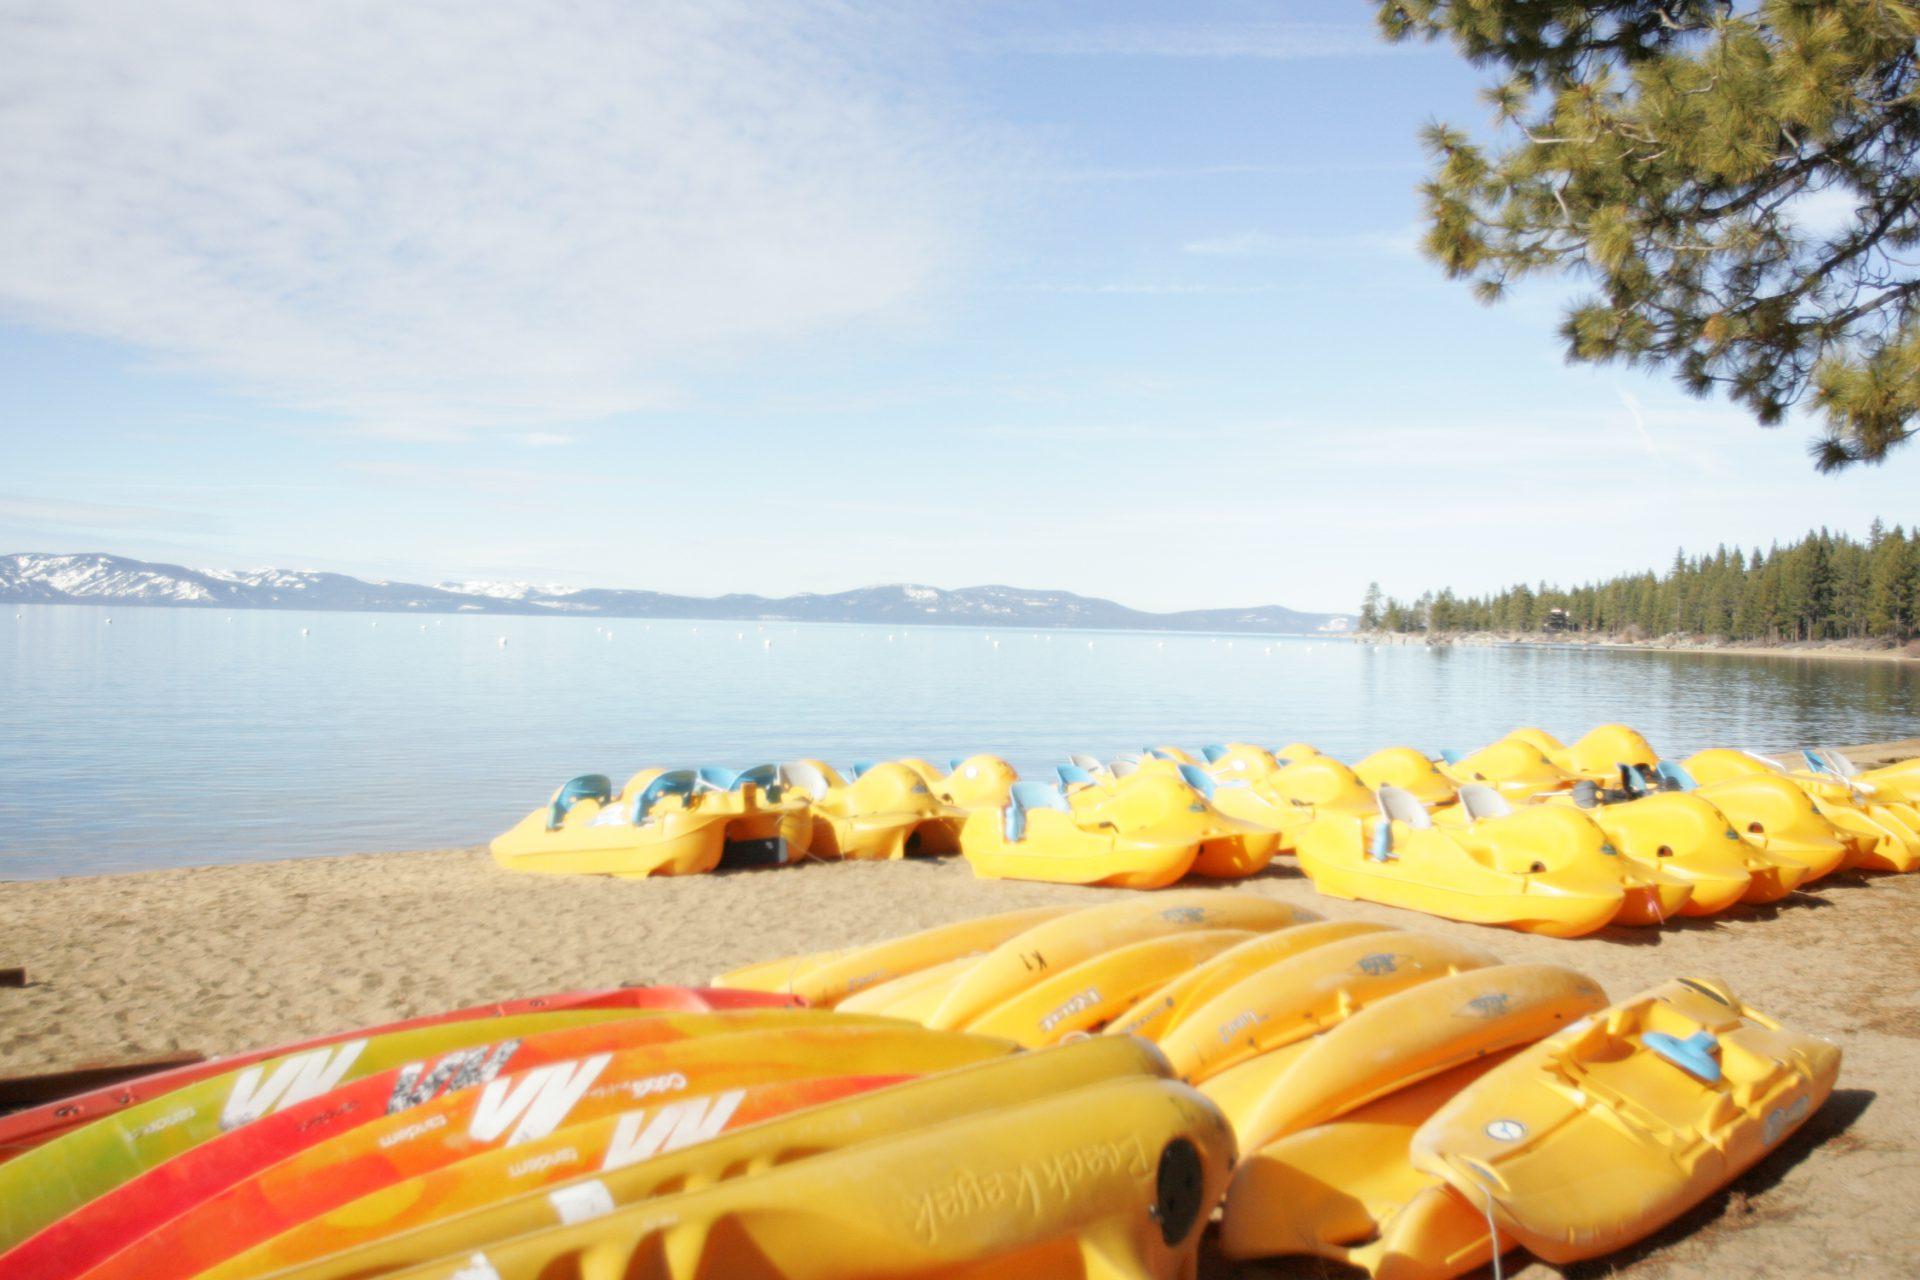 Kayak Rental Zephyr Cove Lake Tahoe